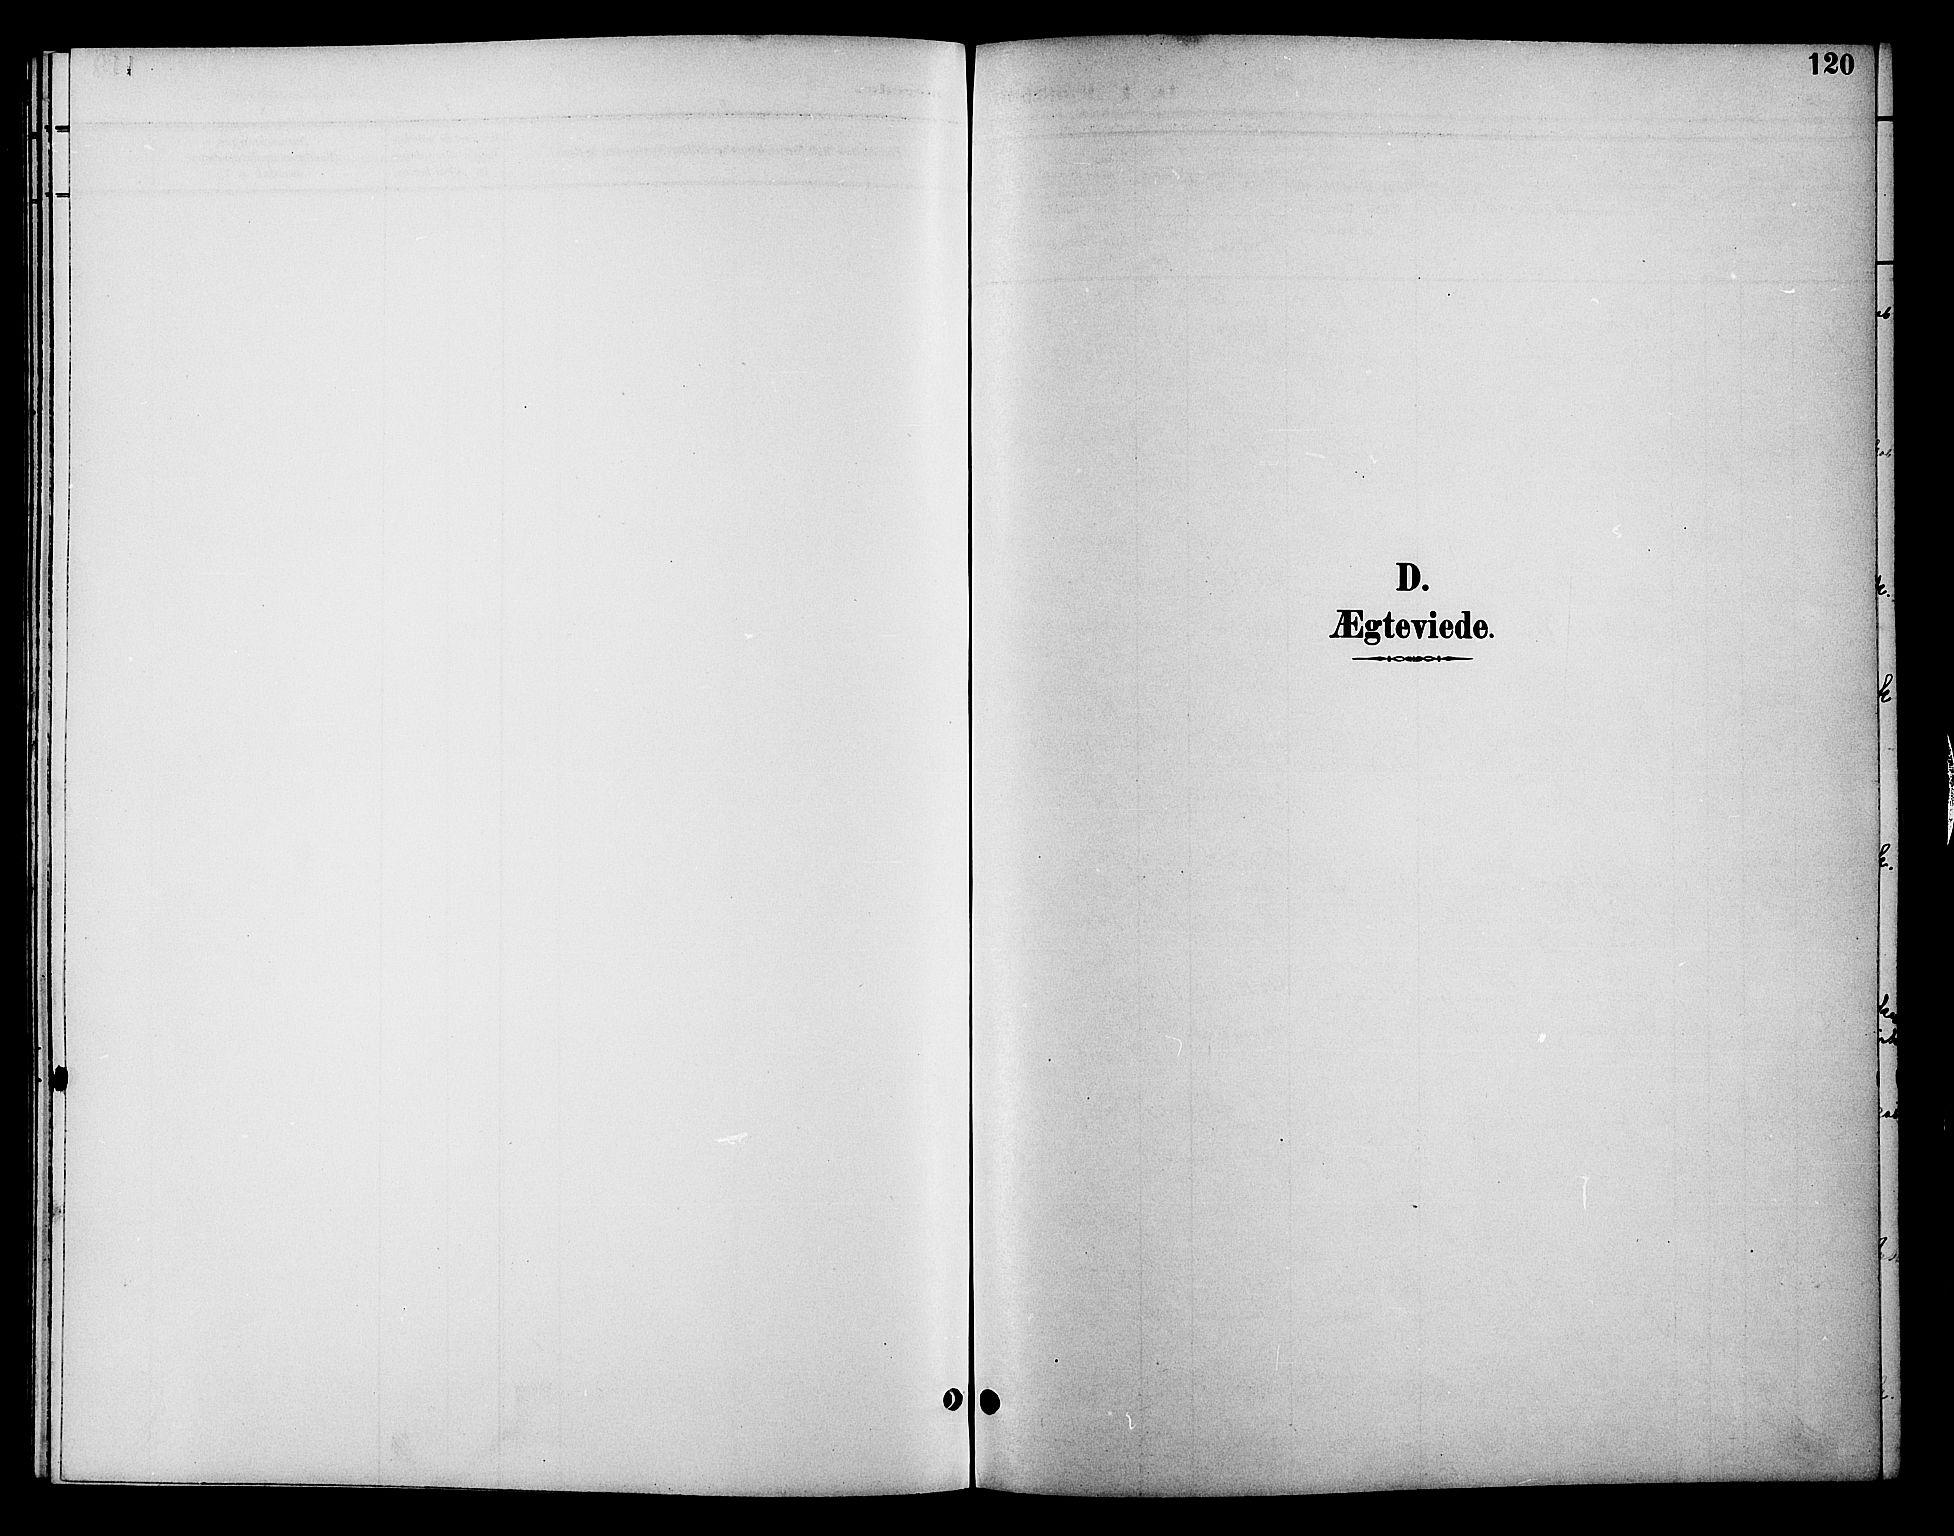 SAH, Fåberg prestekontor, Klokkerbok nr. 10, 1892-1900, s. 120